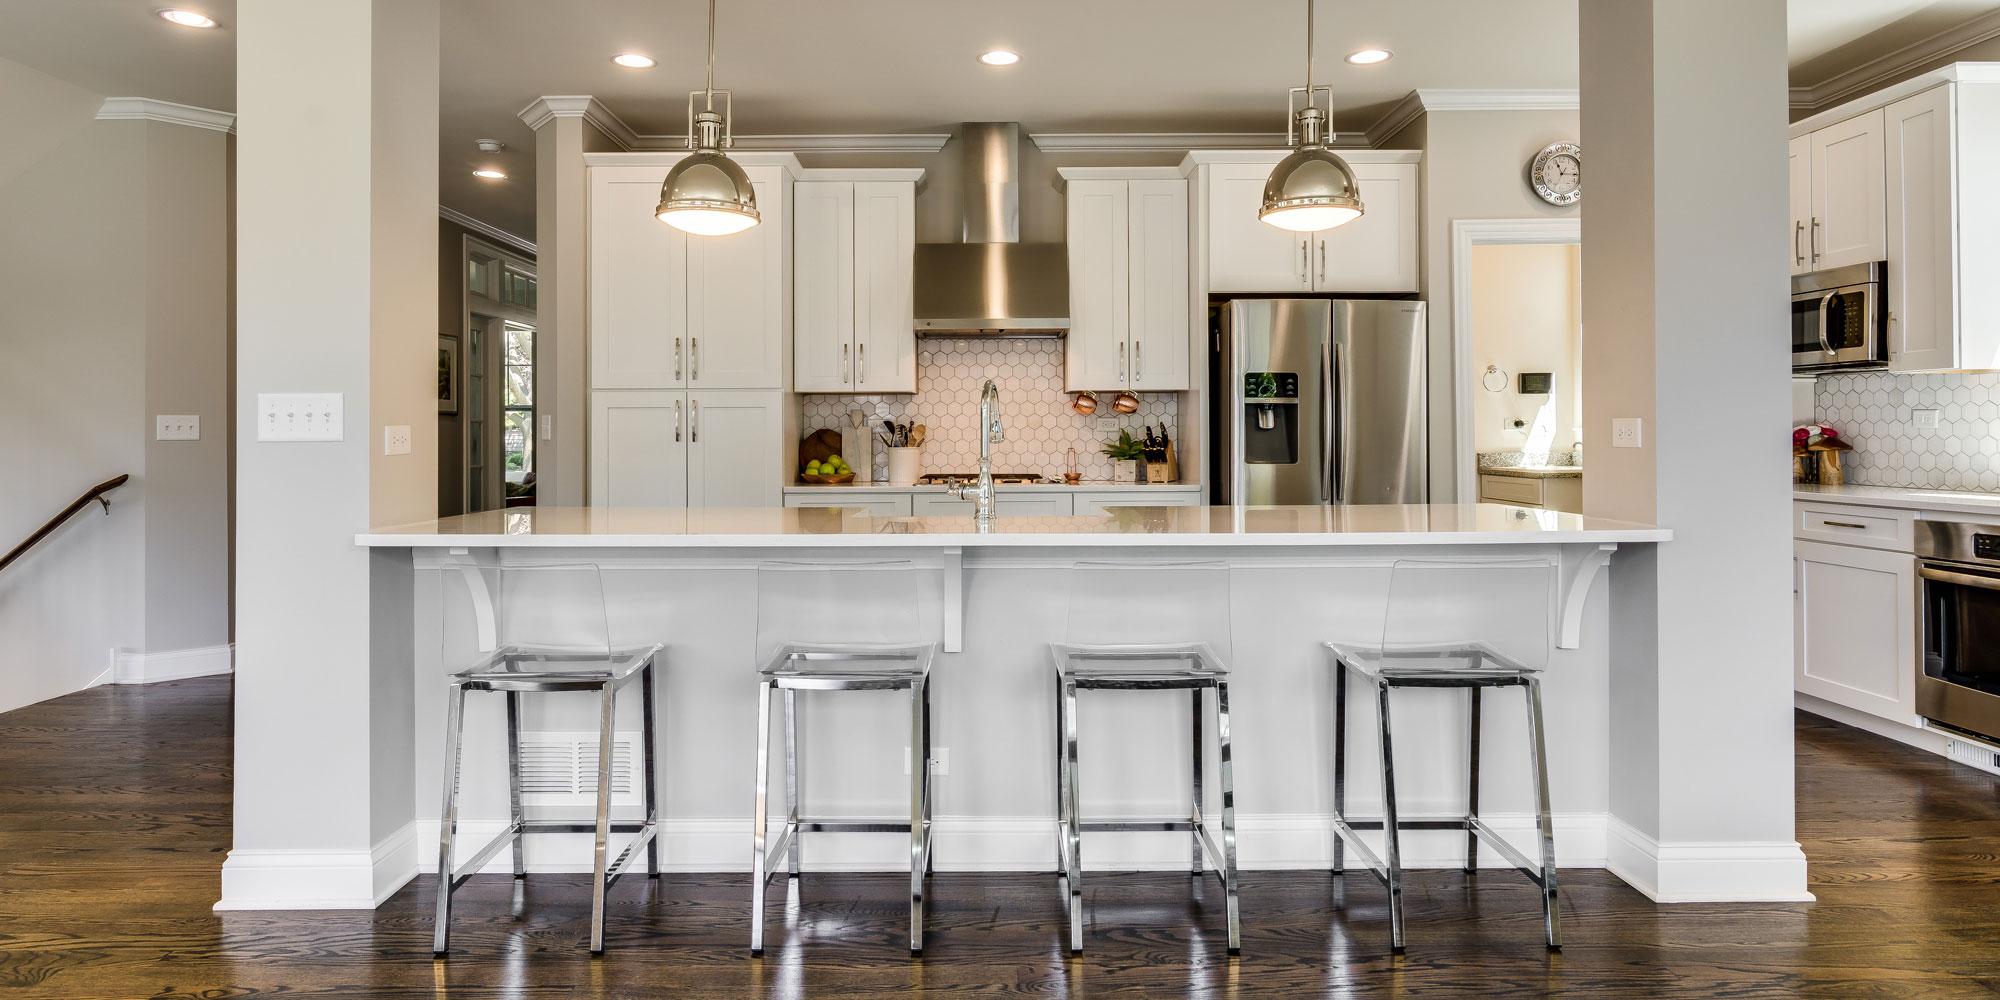 Downers Grove Homes - Mary Braatz | RE/MAX Enterprise